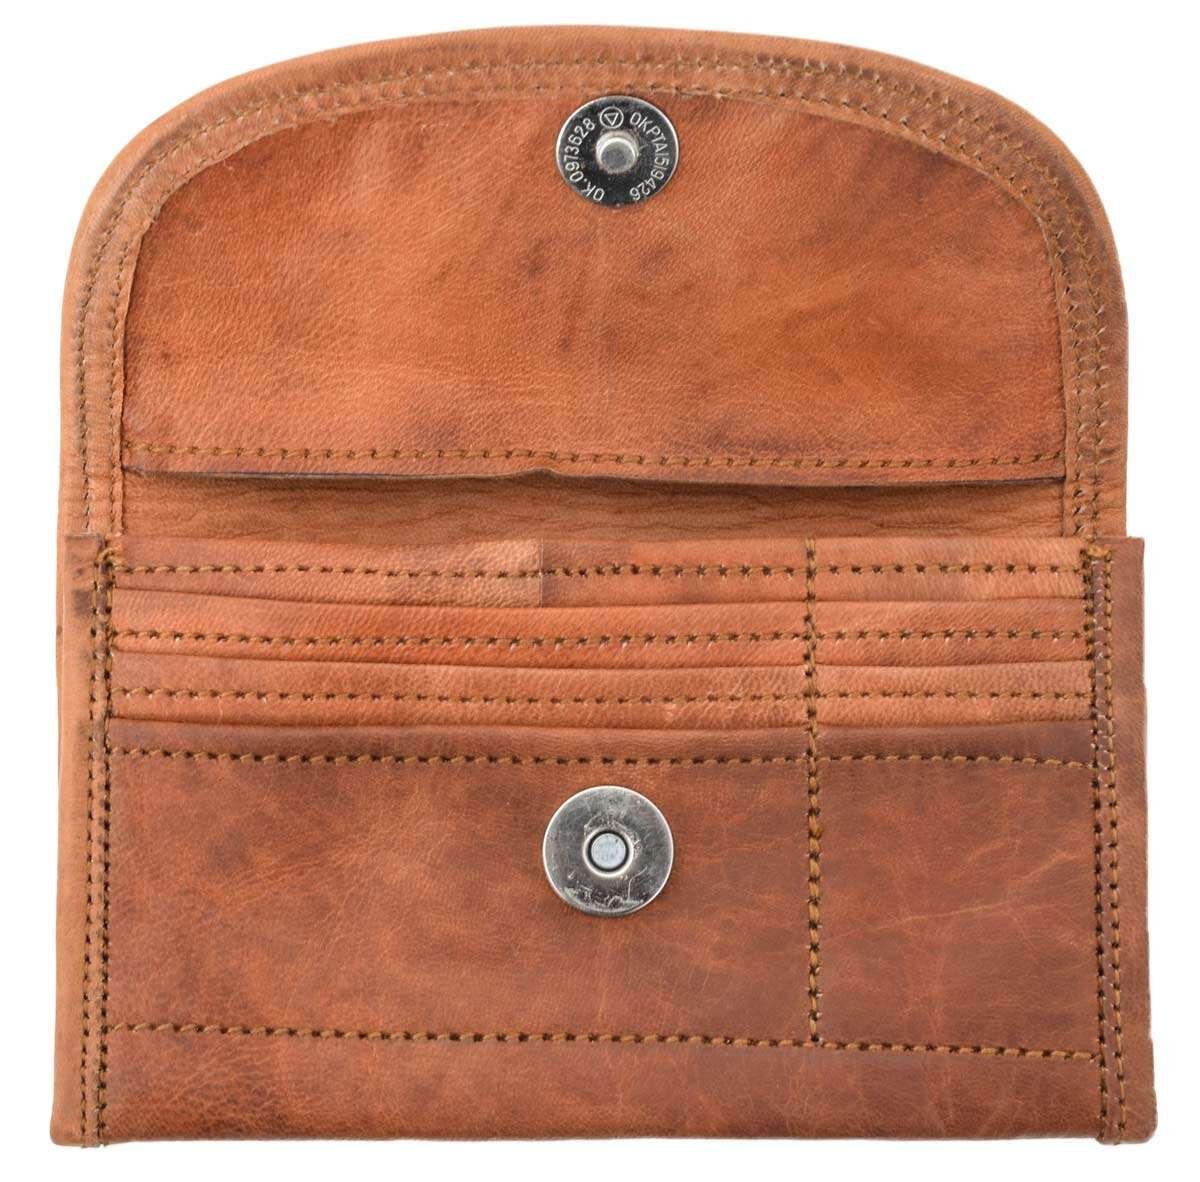 Outlet Portemonnaie - faltiges Leder - ansonsten neu - siehe Video